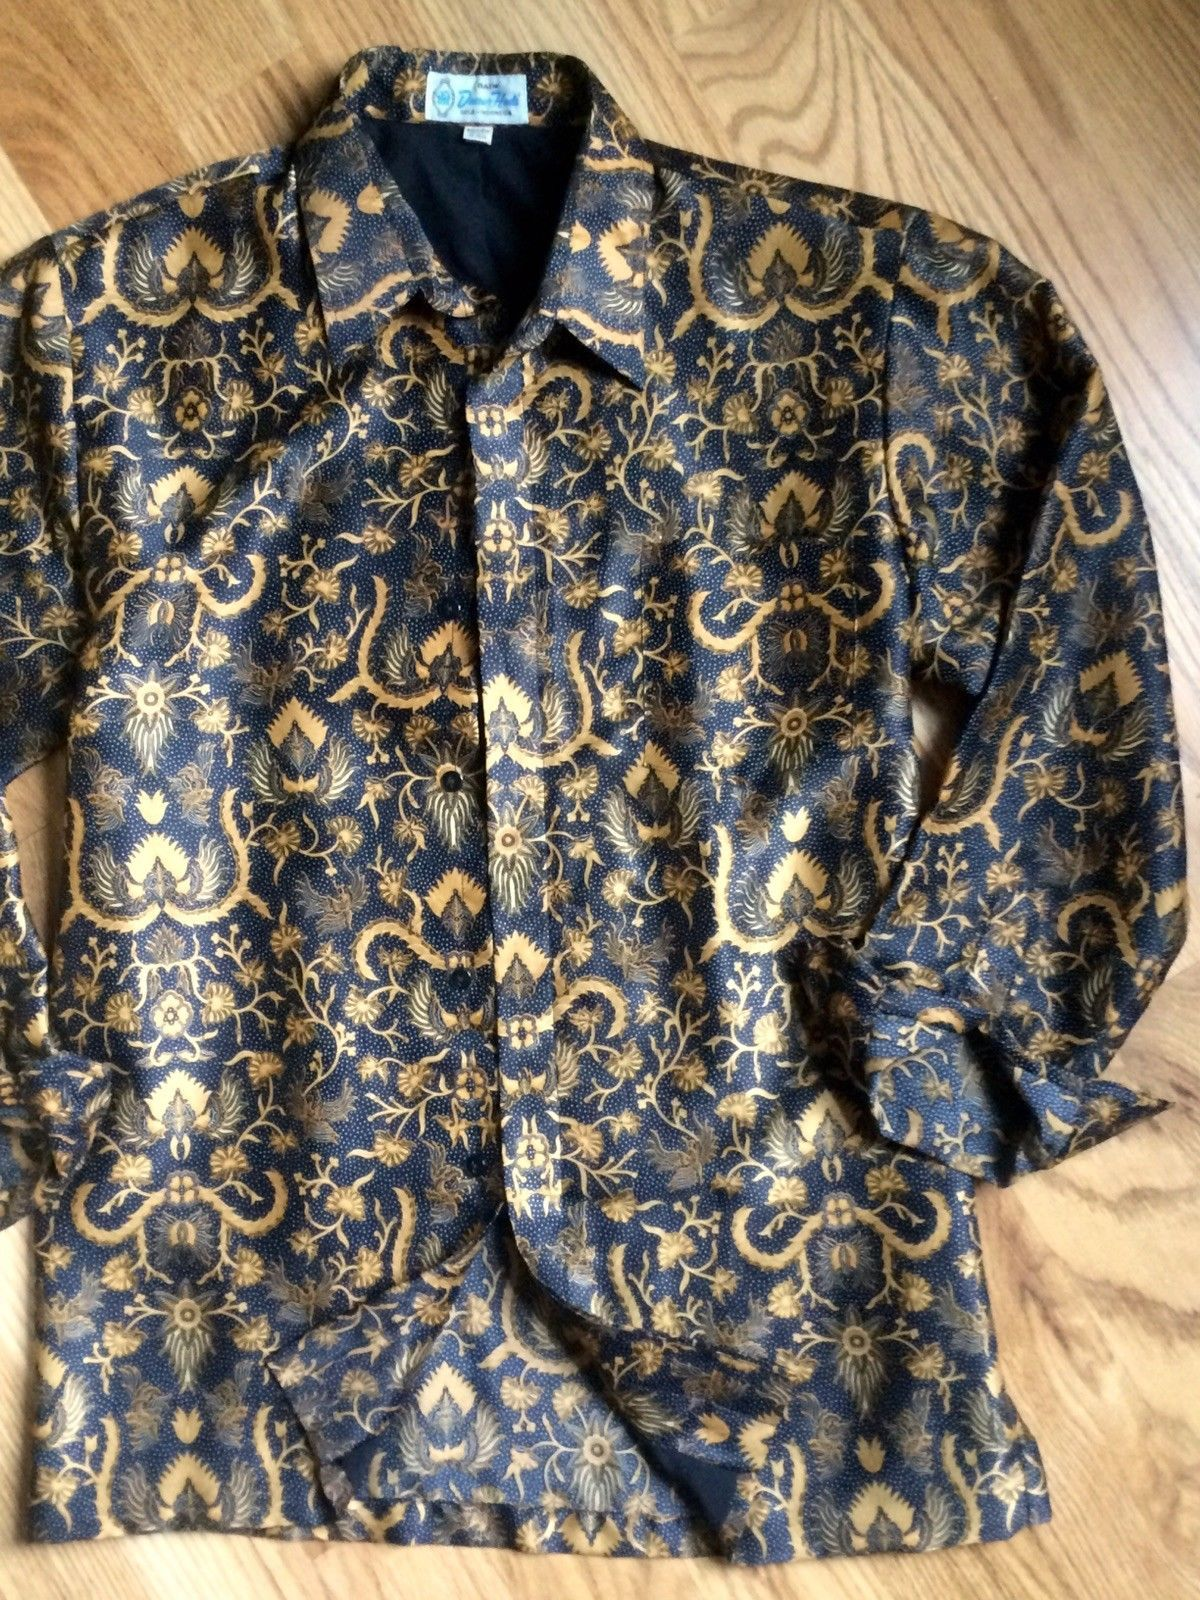 5461d540 39.99 | Vtg Indonesian Baroque Batik Versace Styled Gold Black Shirt ...